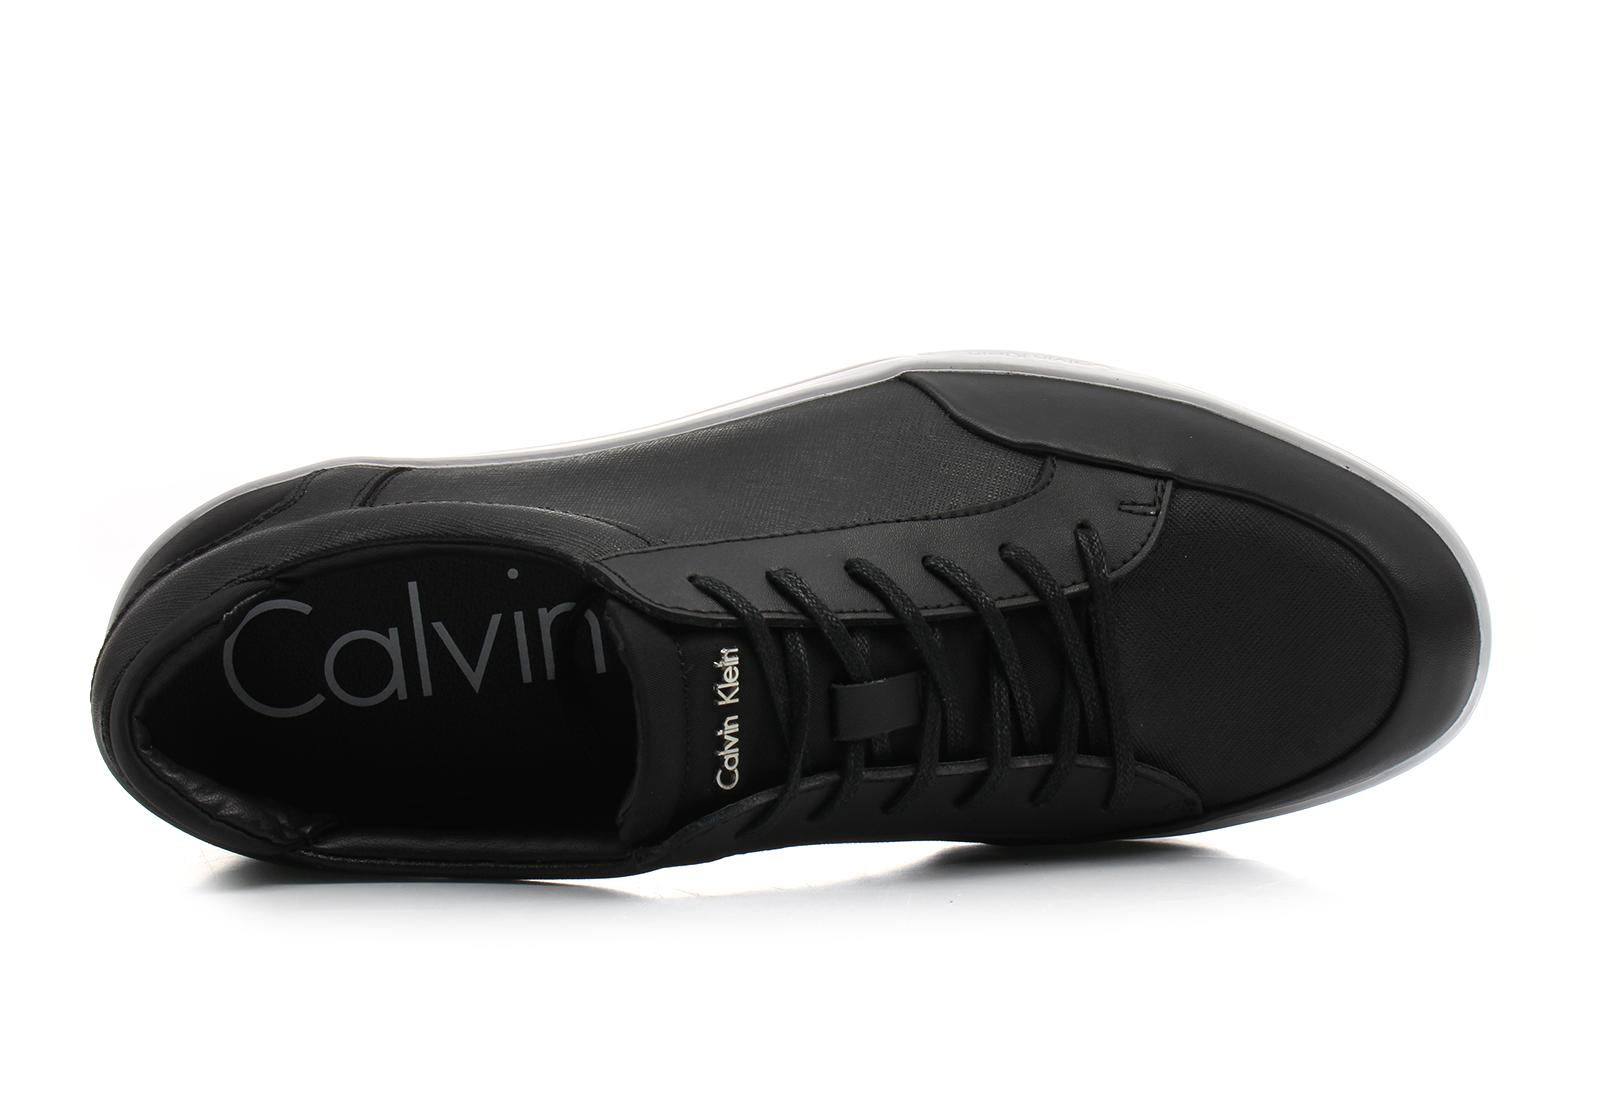 Calvin Klein Black Label Shoes - Balin - F1854-BLK - Online shop for ... 686fa1fe21